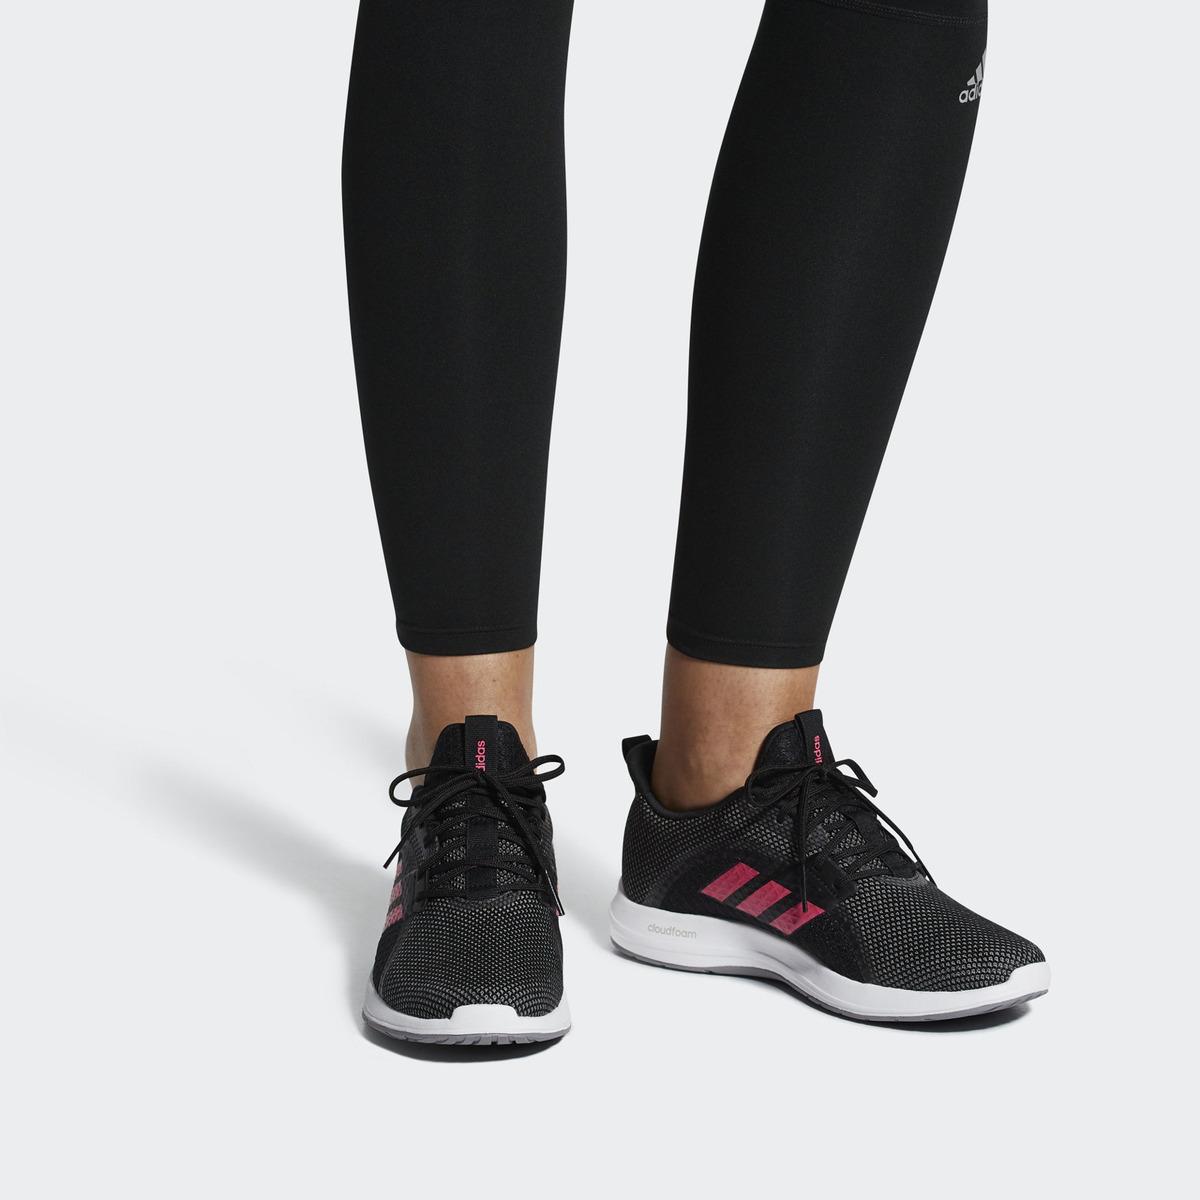 6bef475704f tenis adidas element 04 2018 cm7302 preto pink. Carregando zoom.